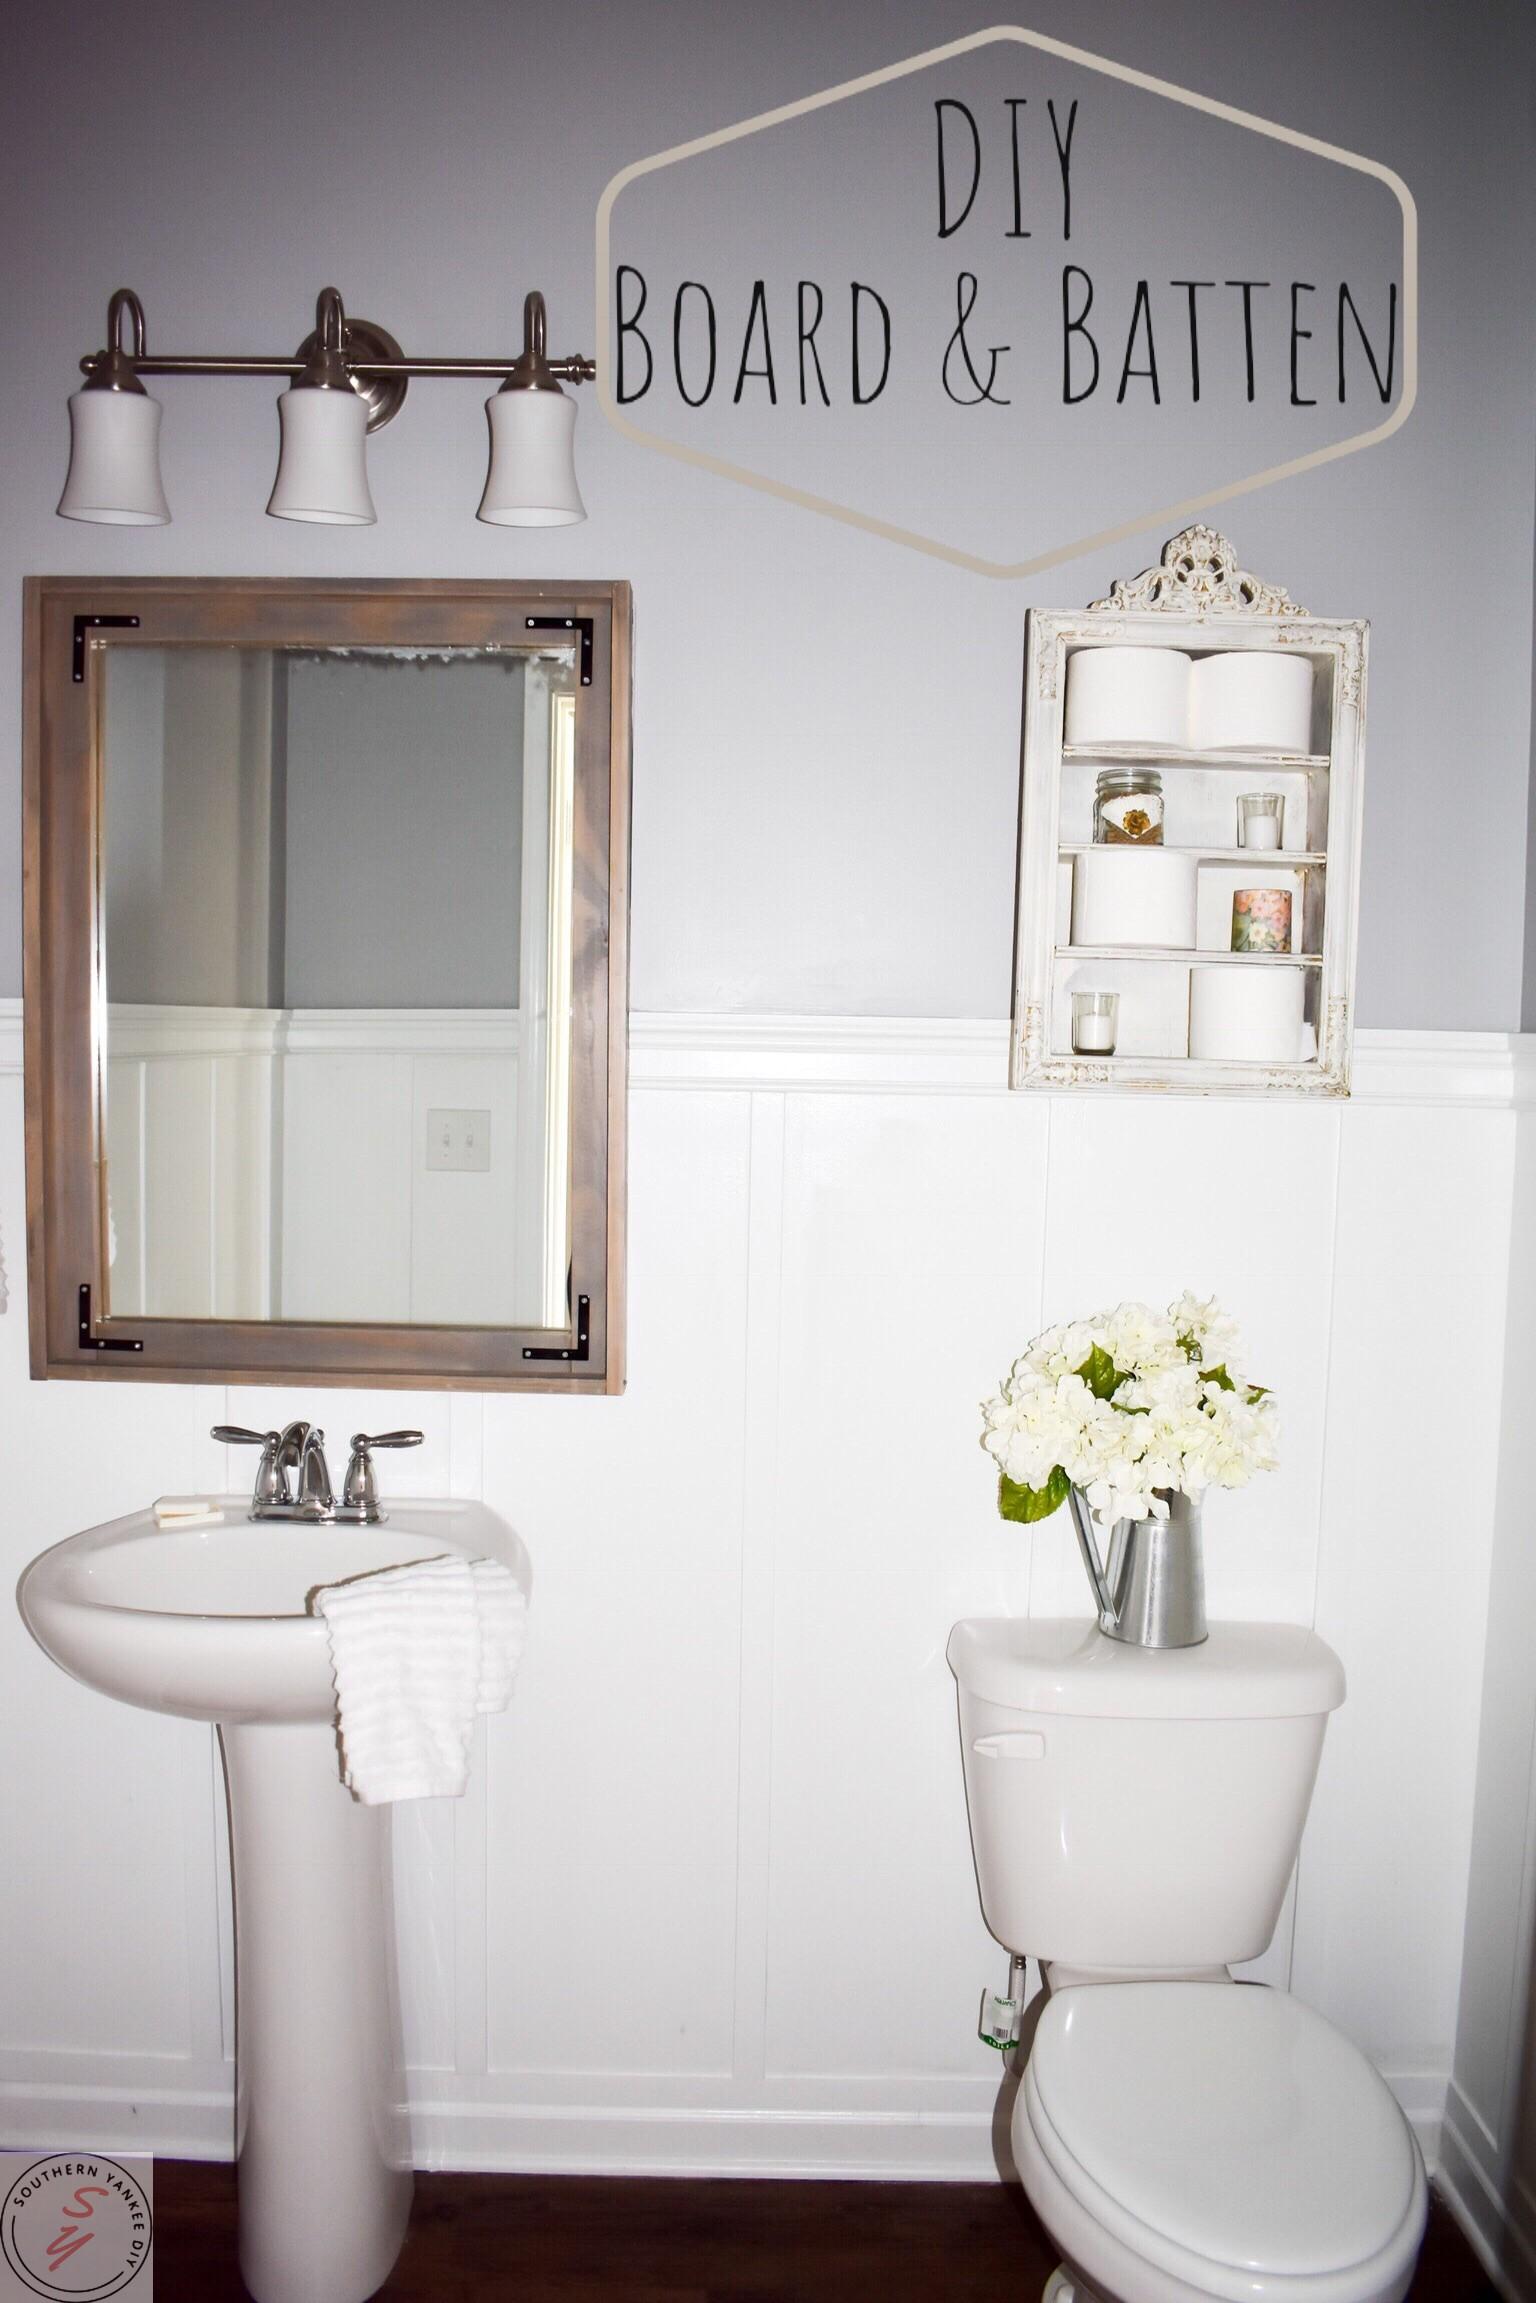 1/2 Bathroom Board and Batten ~ Southern Yankee DIY